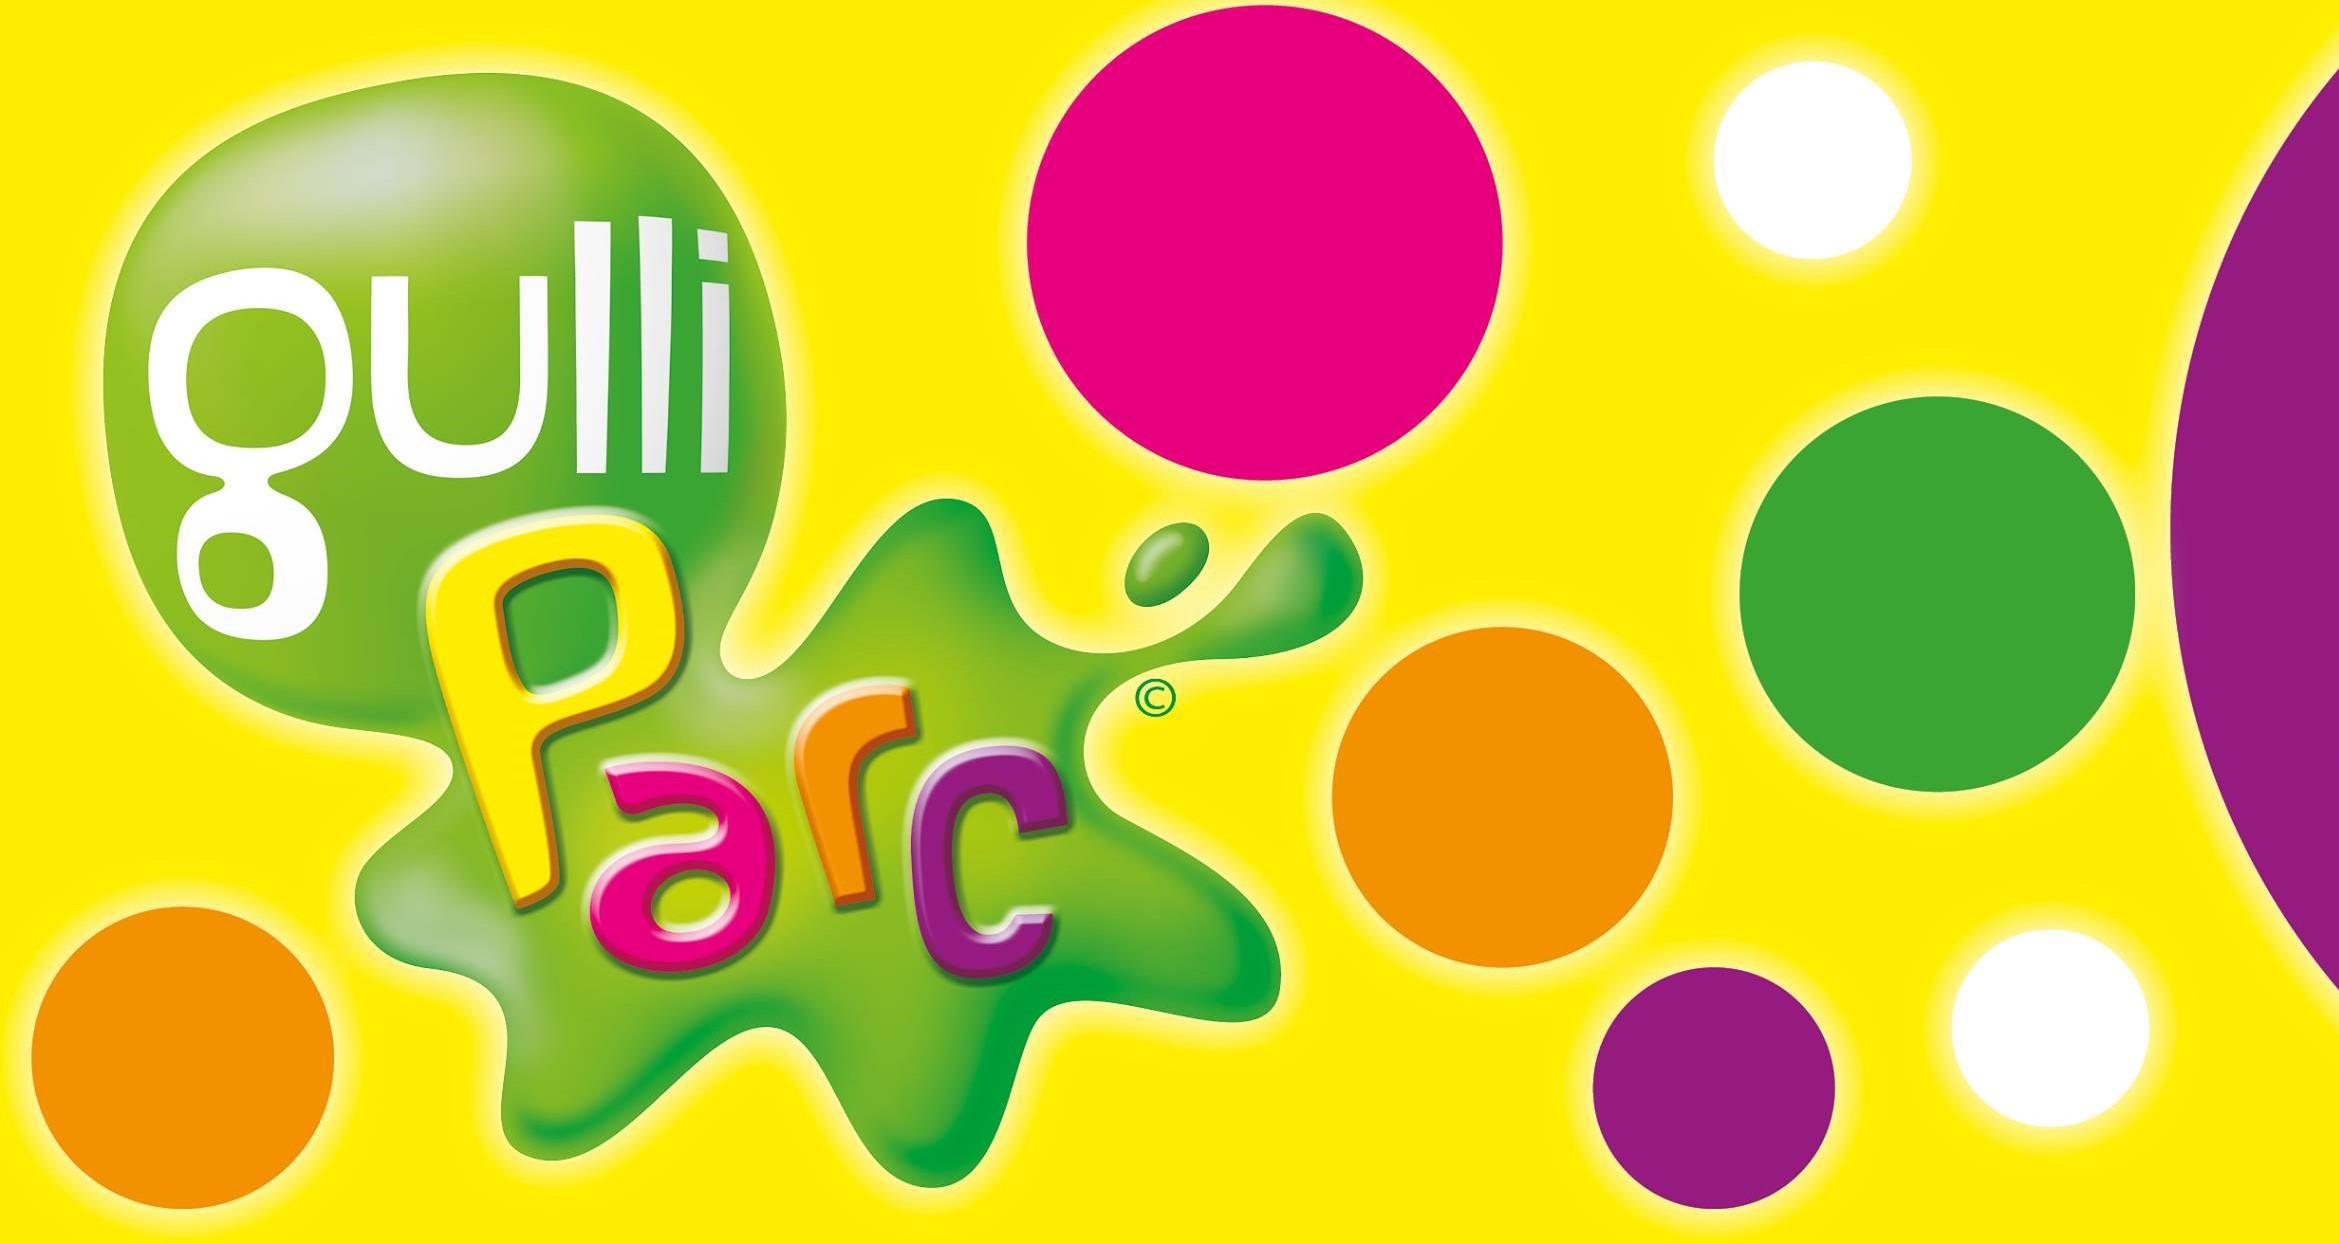 Image Gulli Parc - Thiais